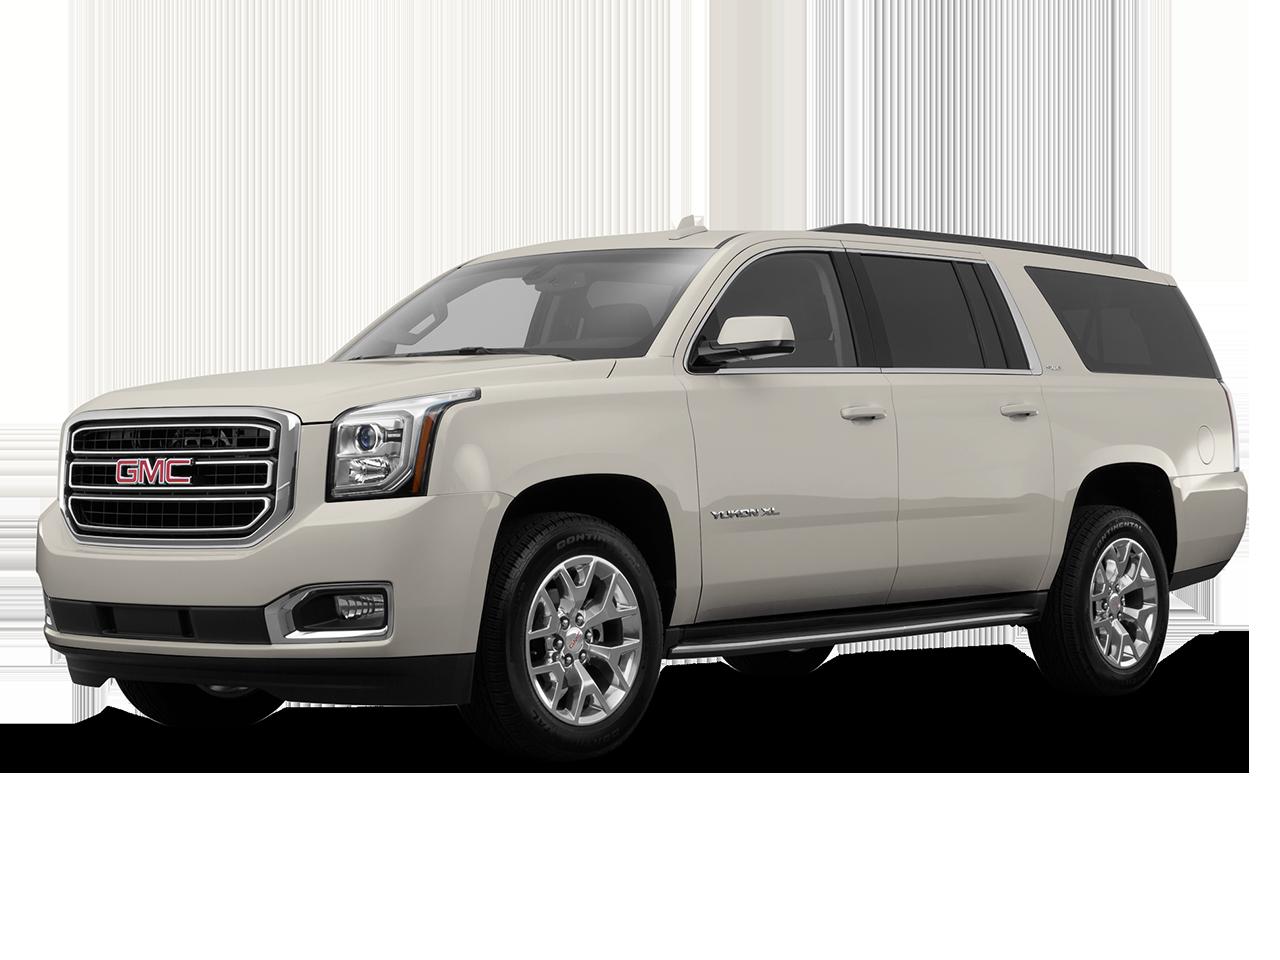 2017 Gmc Yukon Xl Dealer In Orange County Hardin Buick Gmc